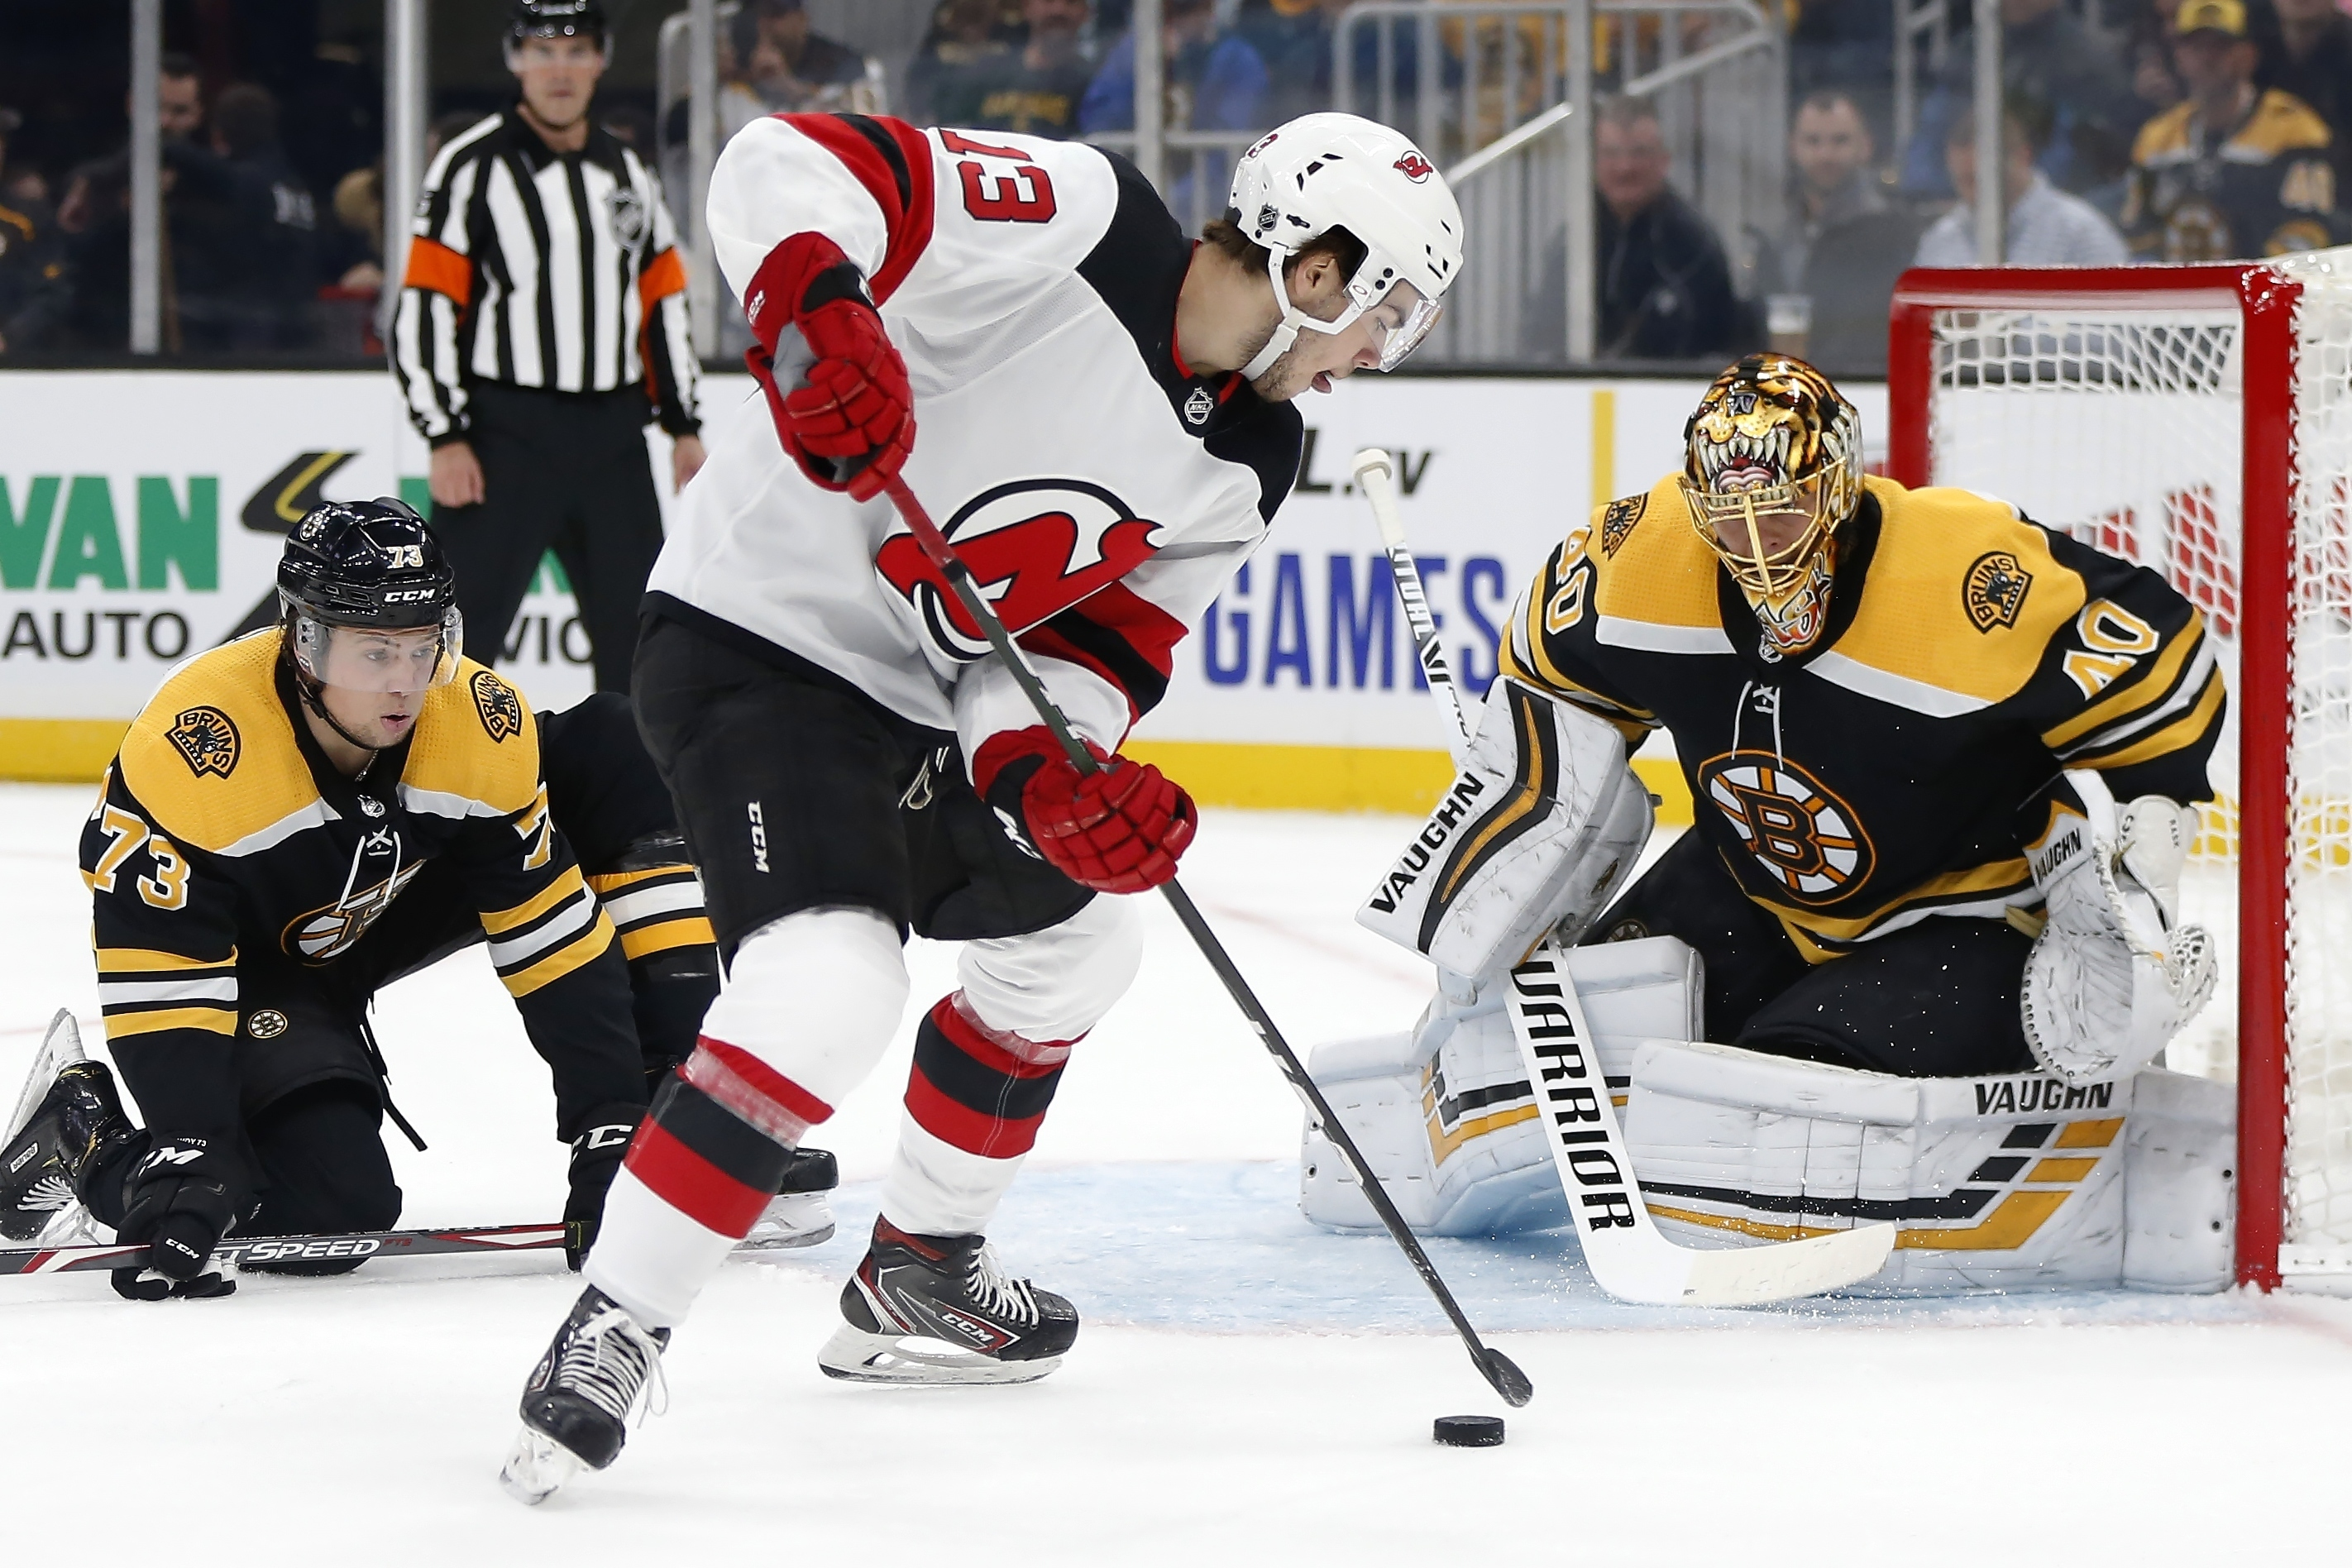 Devils sign Hischier to $50.75 million, 7-year extension